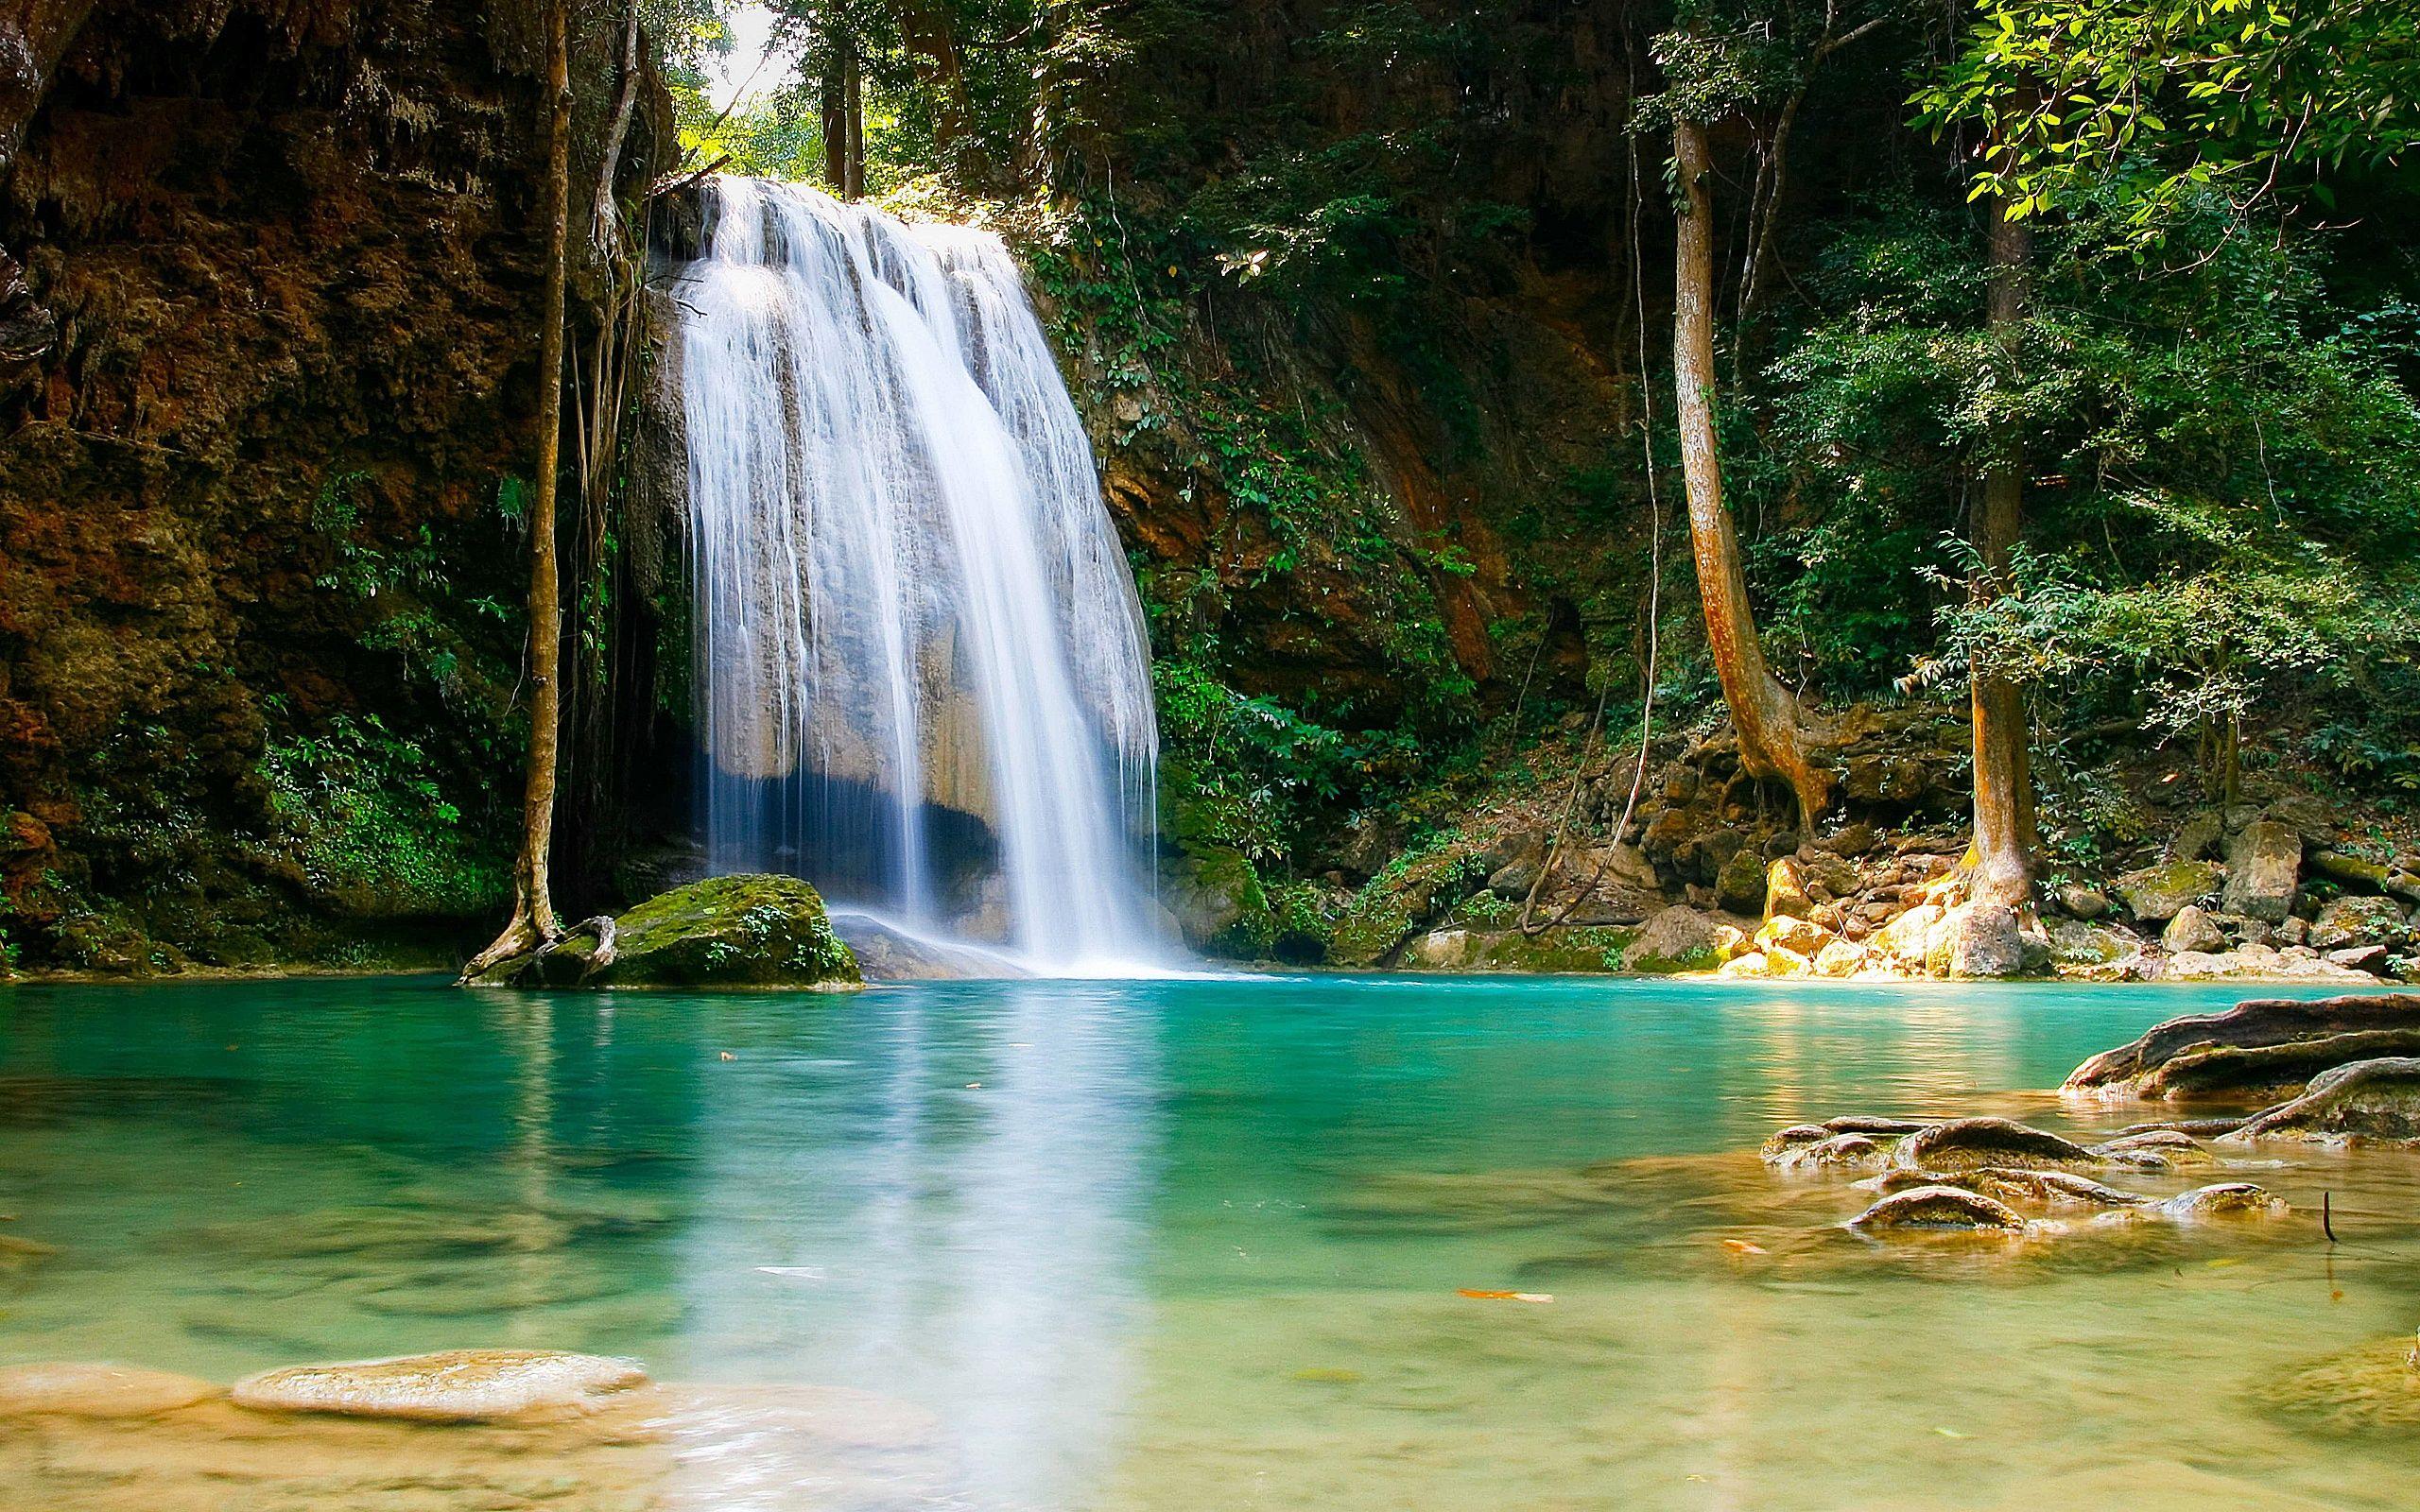 Beautiful Waterfall Hd Pics 7014890 Waterfall Wallpaper Nature Wallpaper Waterfall Pictures